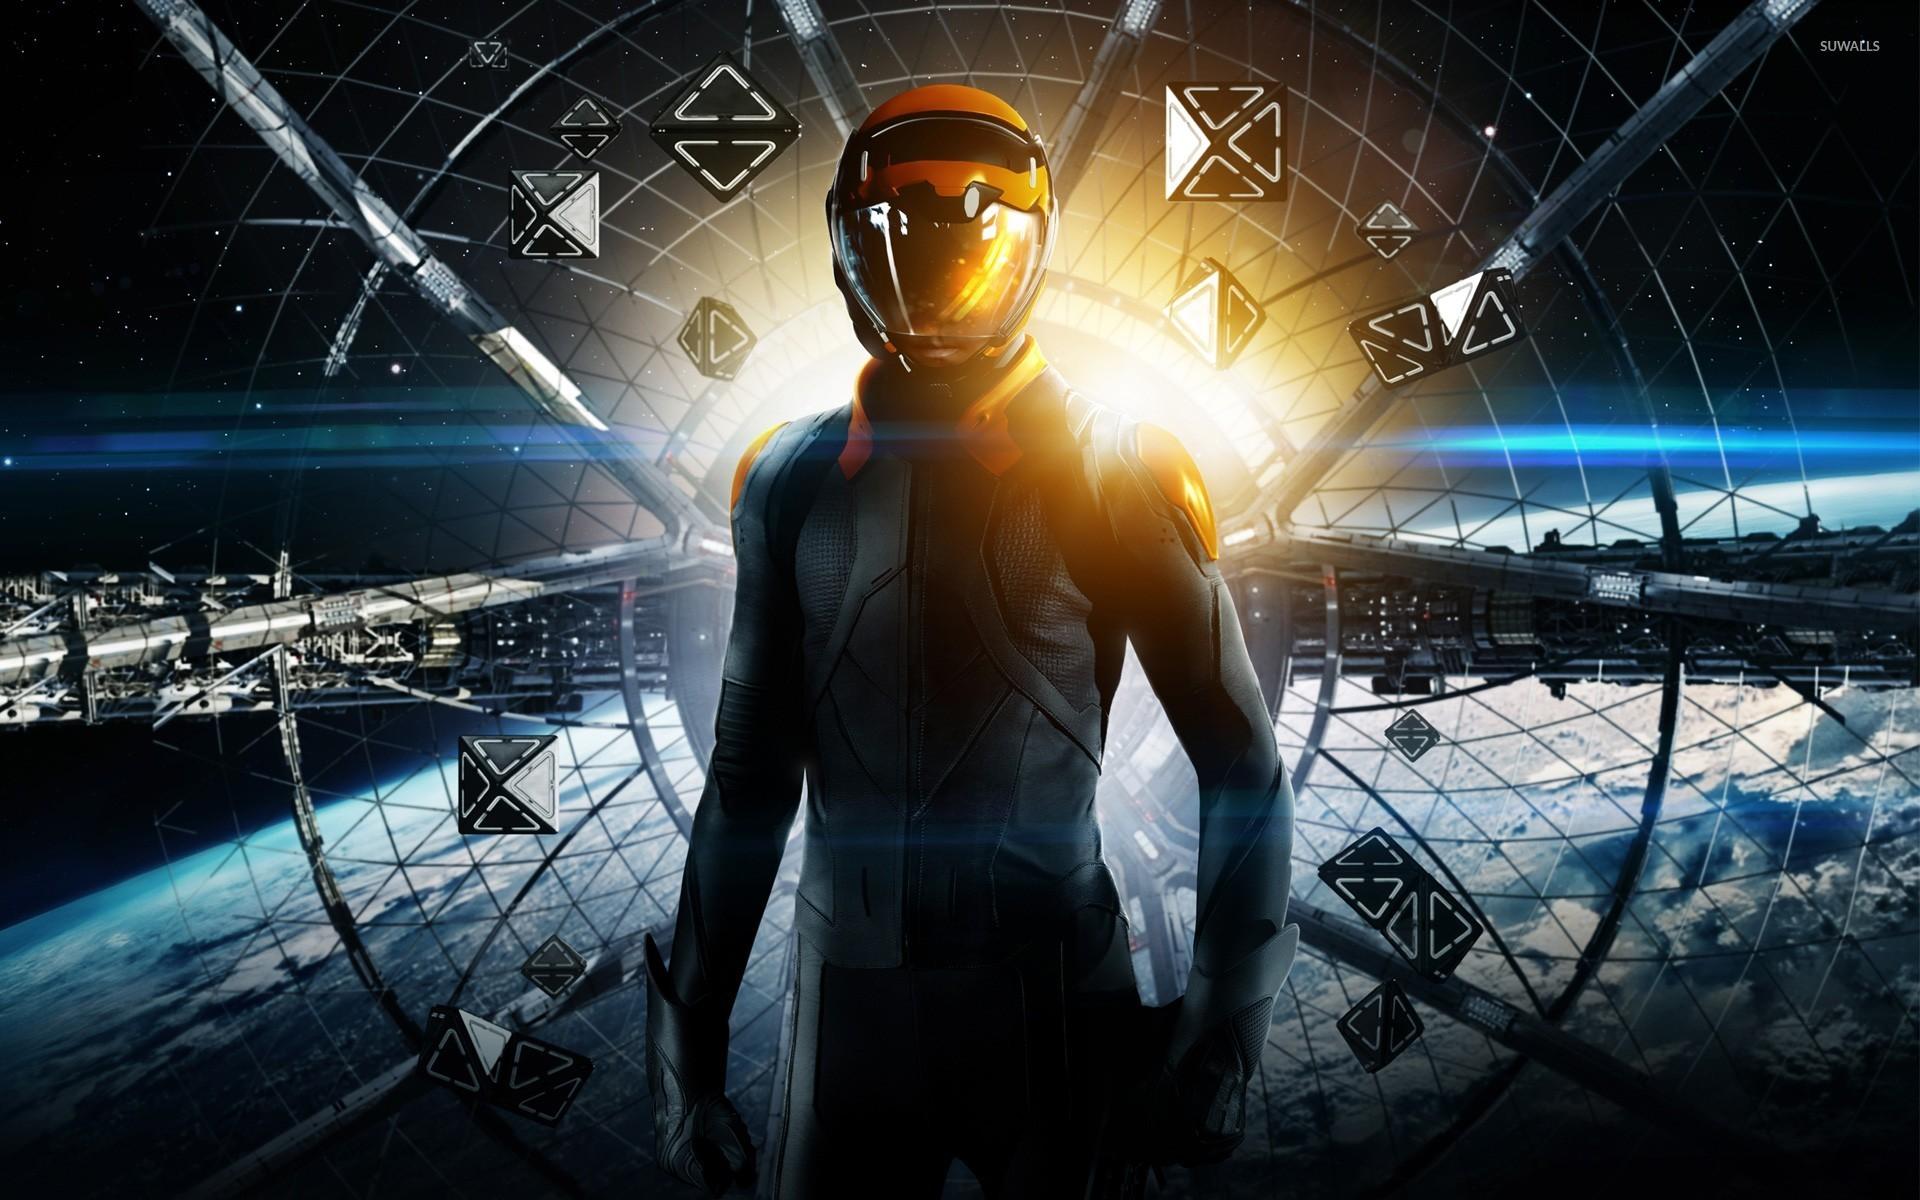 Ender Wiggin - Ender's Game wallpaper - Movie wallpapers ...